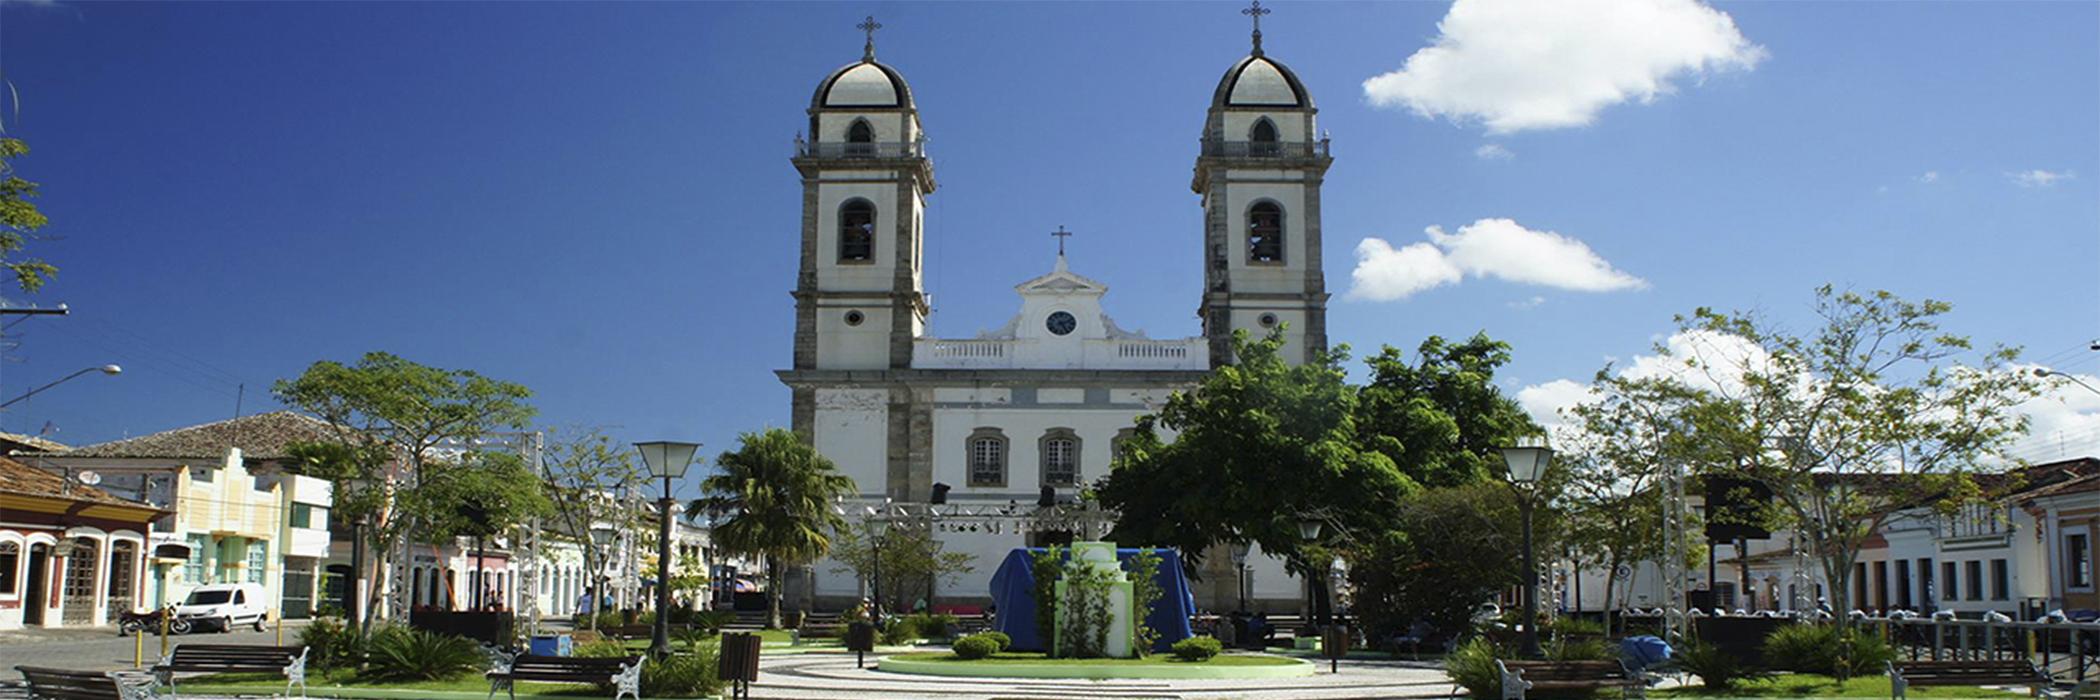 CIRCUITO LAGAMAR - SP DE CICLOTURISMO Litoral Sul São Paulo - IGUAPE